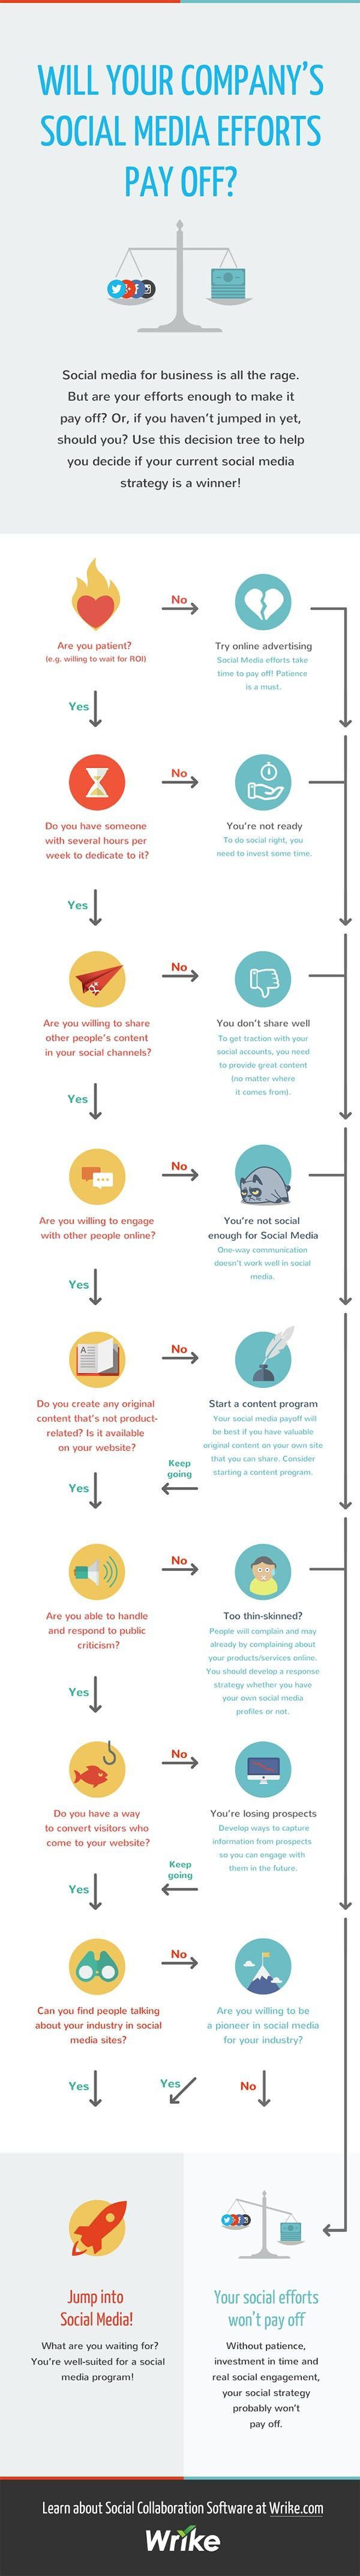 8 Reasons Your Social Media Marketing Strategy is Guaranteed to Fail